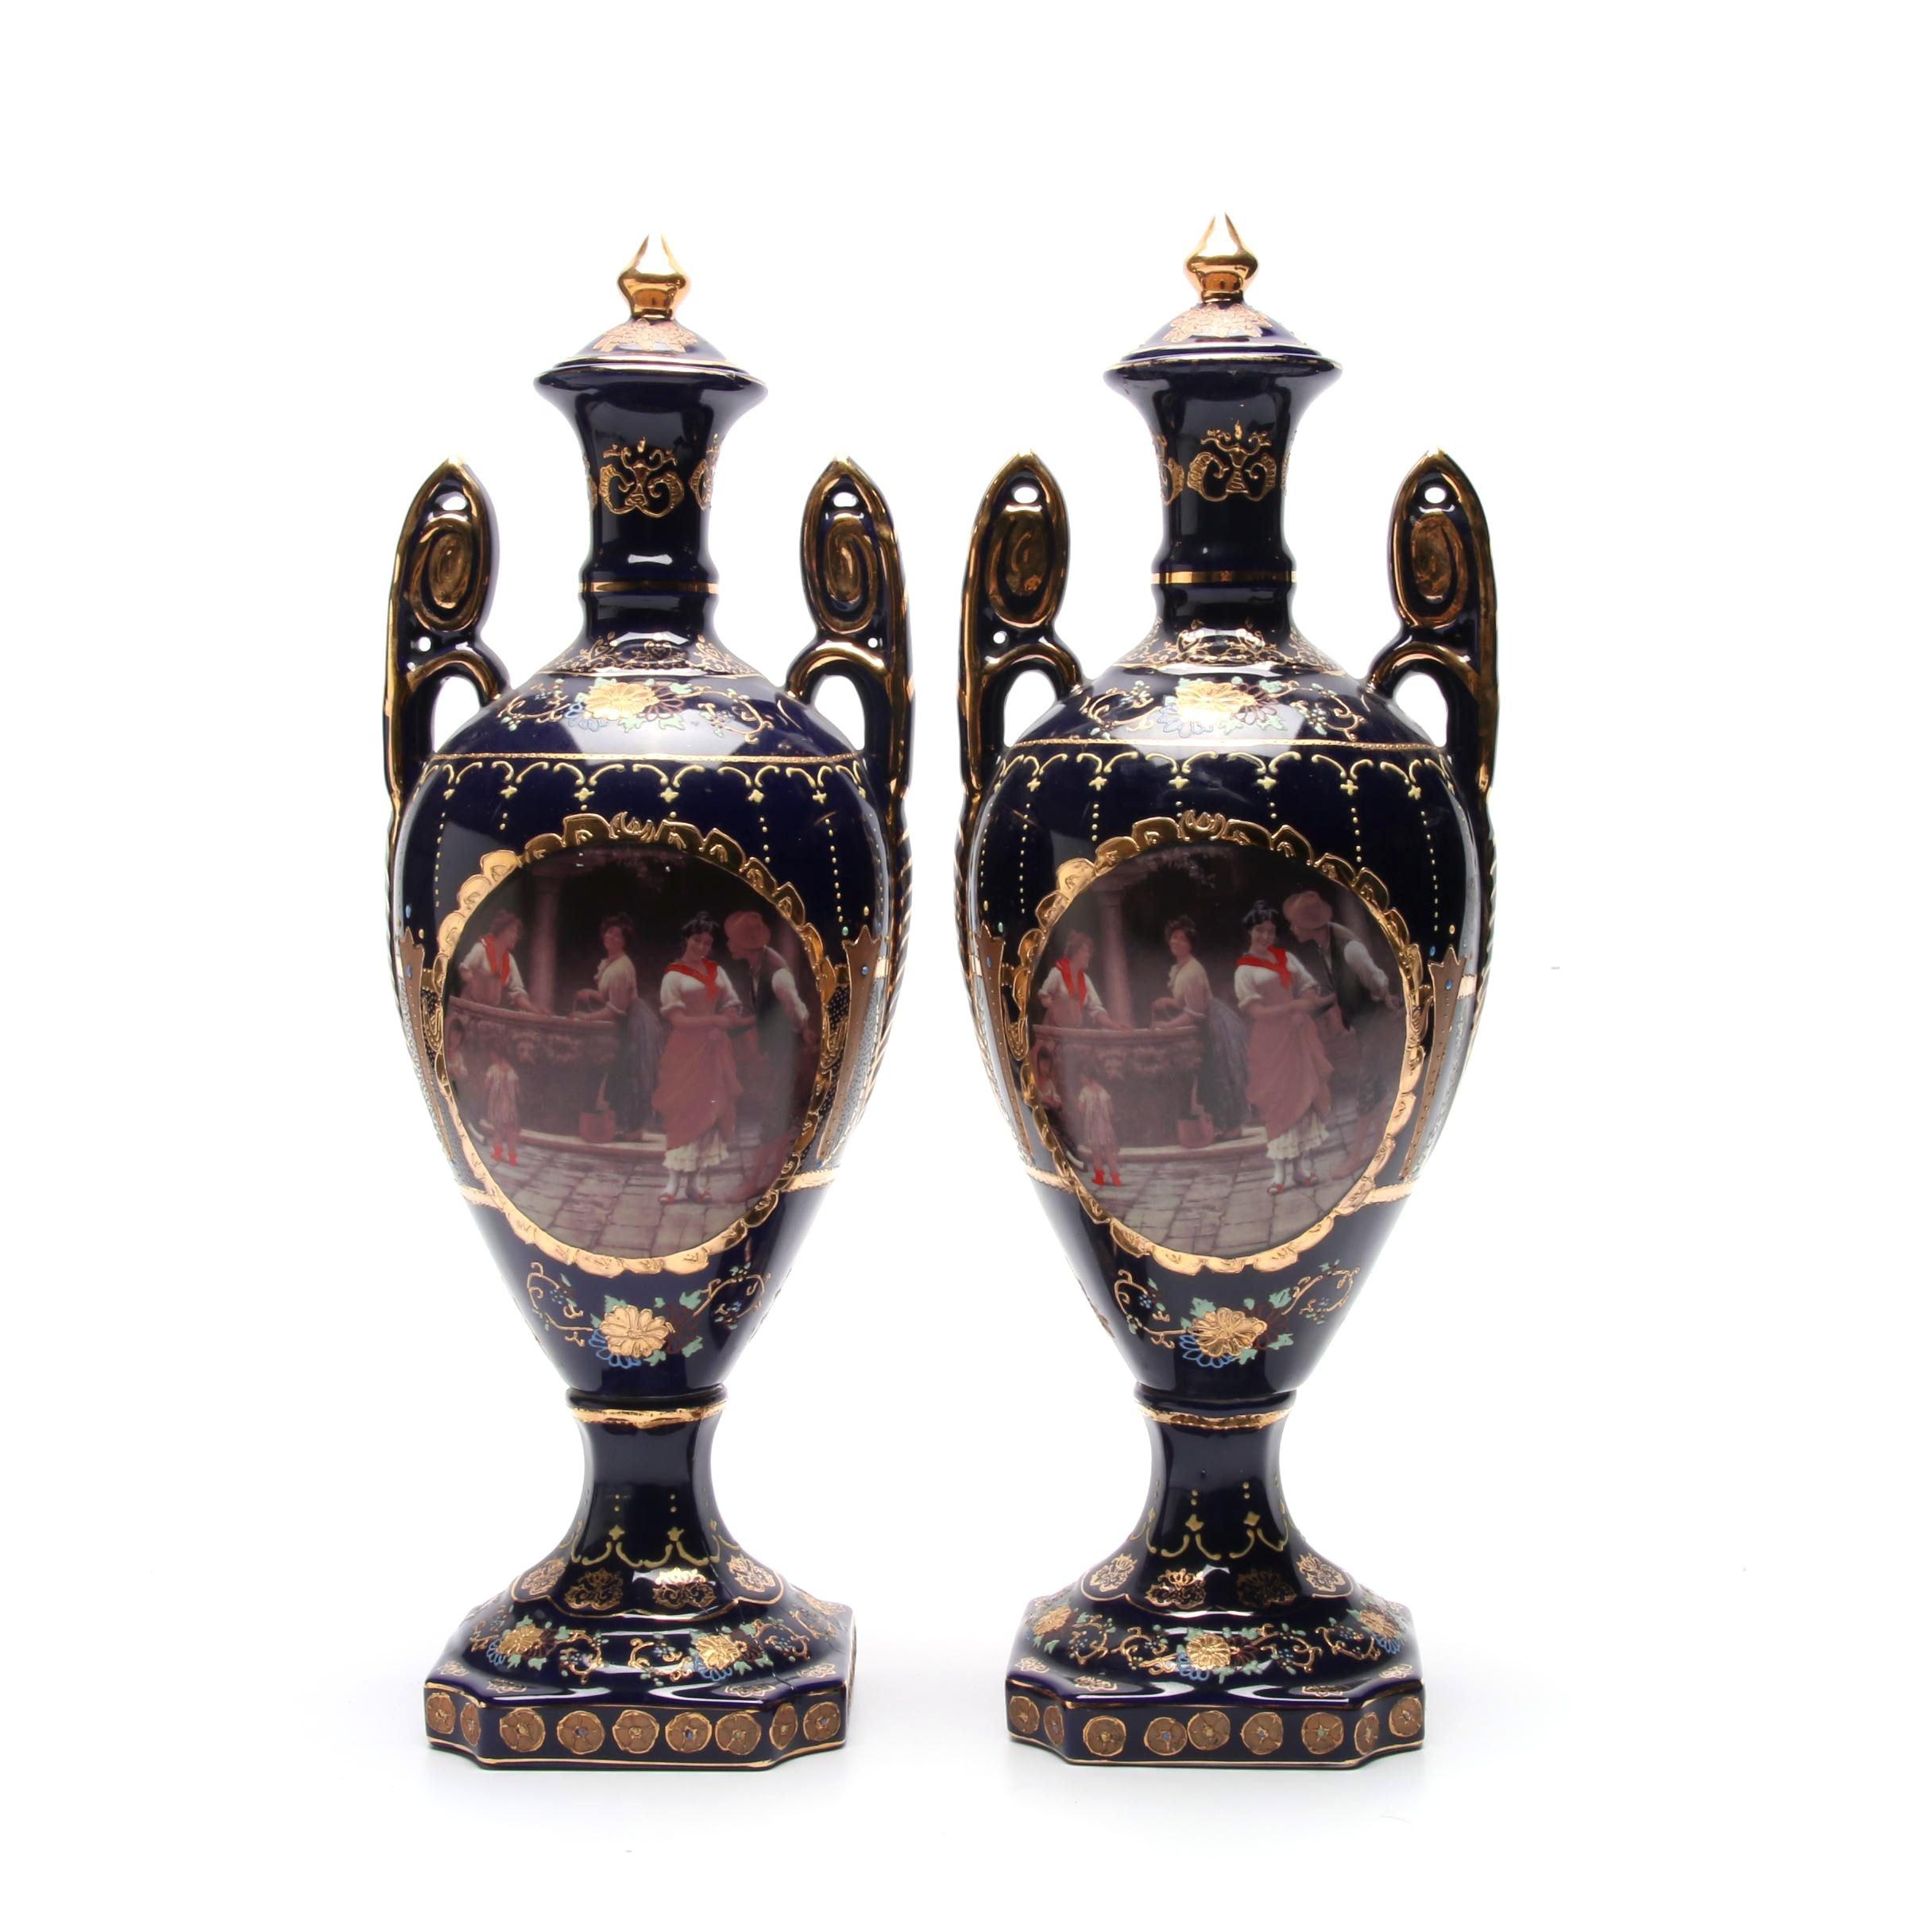 Pair of Limoges Style Garniture Vases